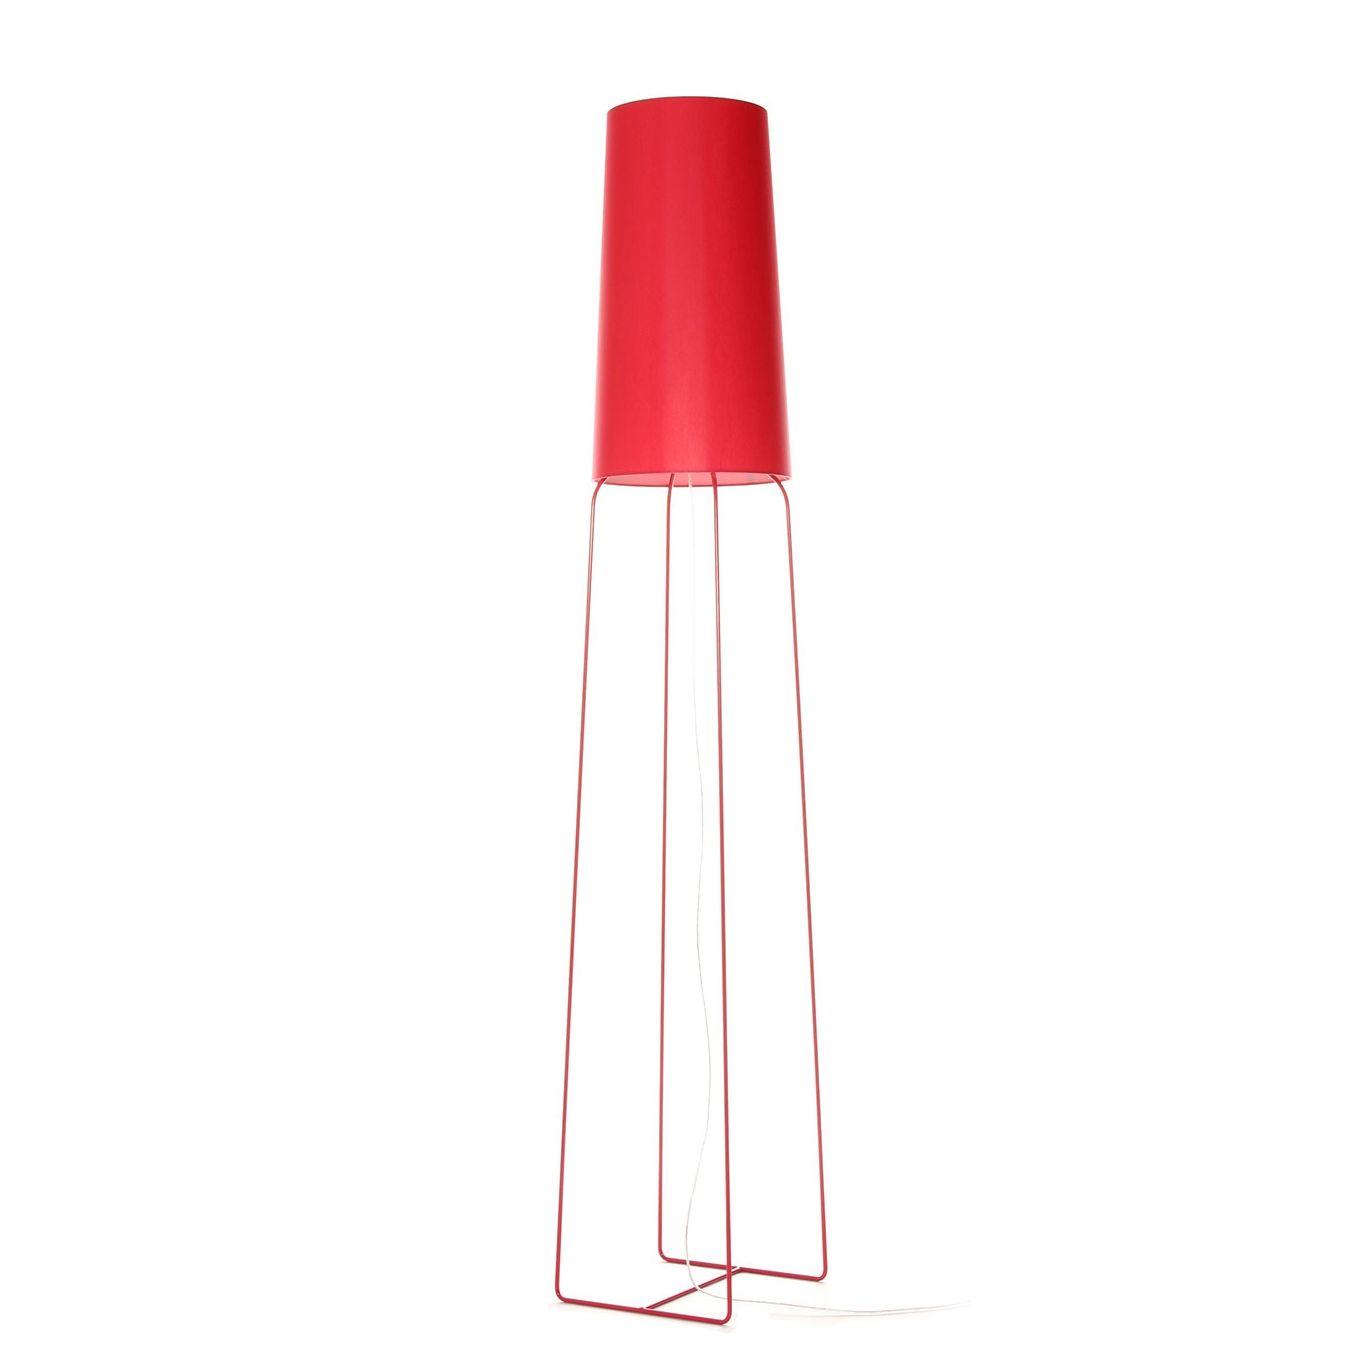 SlimSophie vloerlamp FrauMaier rood